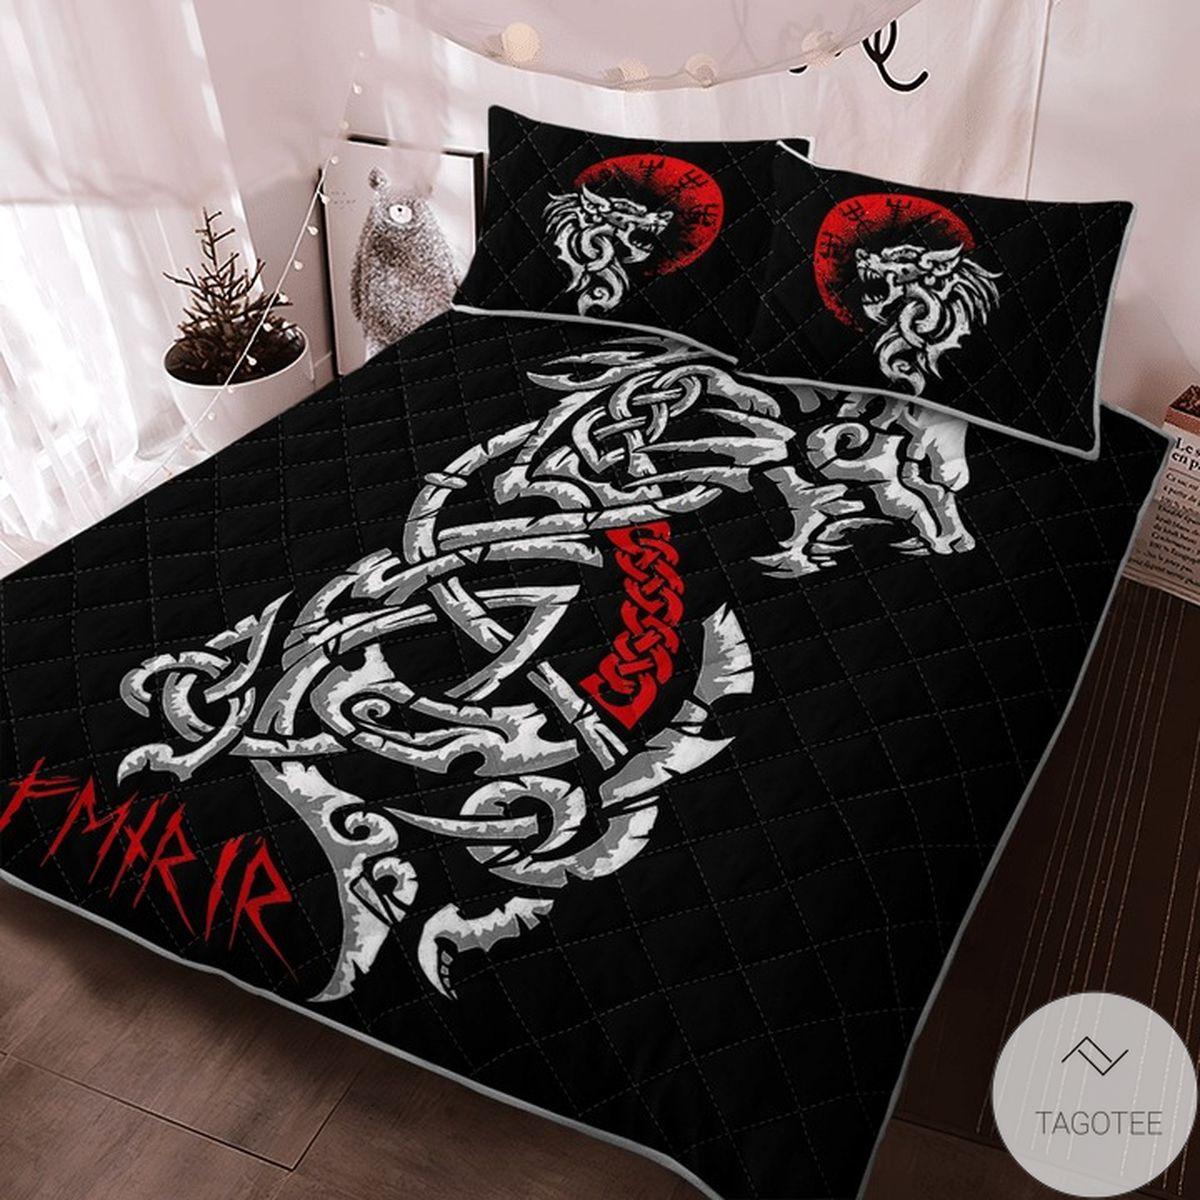 Father's Day Gift Dragon Fenrir - Viking Black Quilt Bedding Set